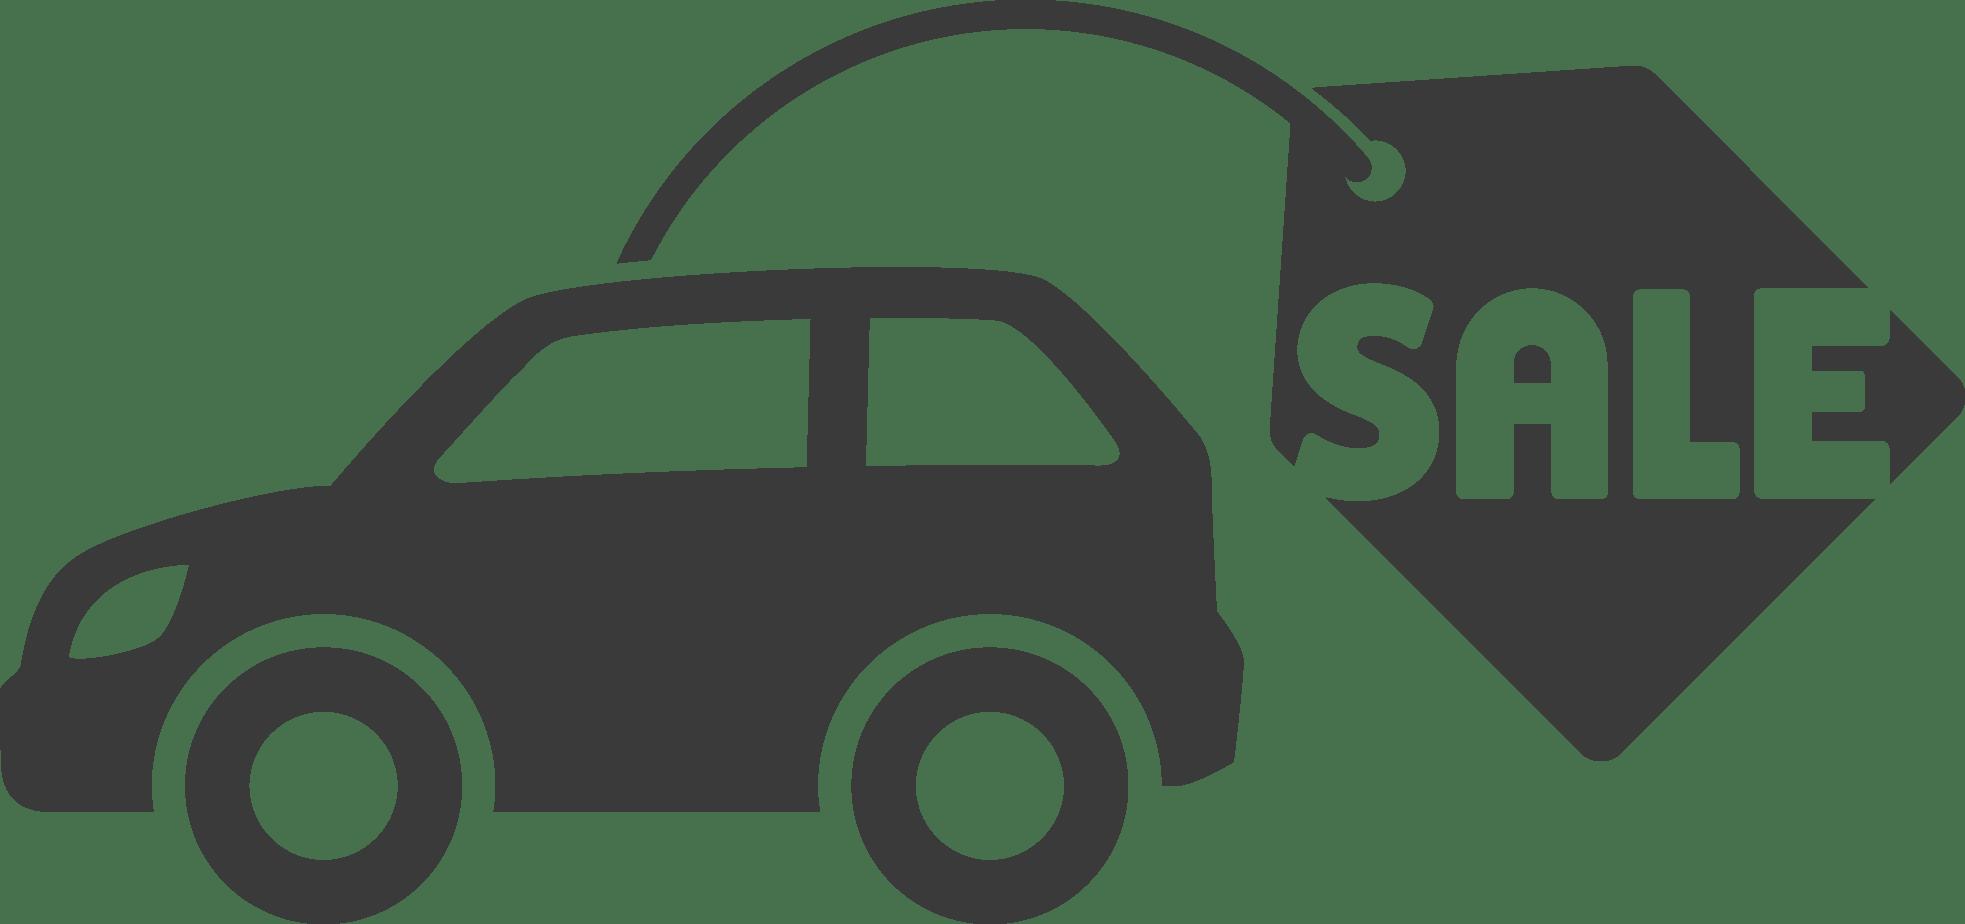 Car salesperson clipart clip art royalty free stock Surprised by hidden costs? - Alberta Motor Vehicle Industry Council clip art royalty free stock